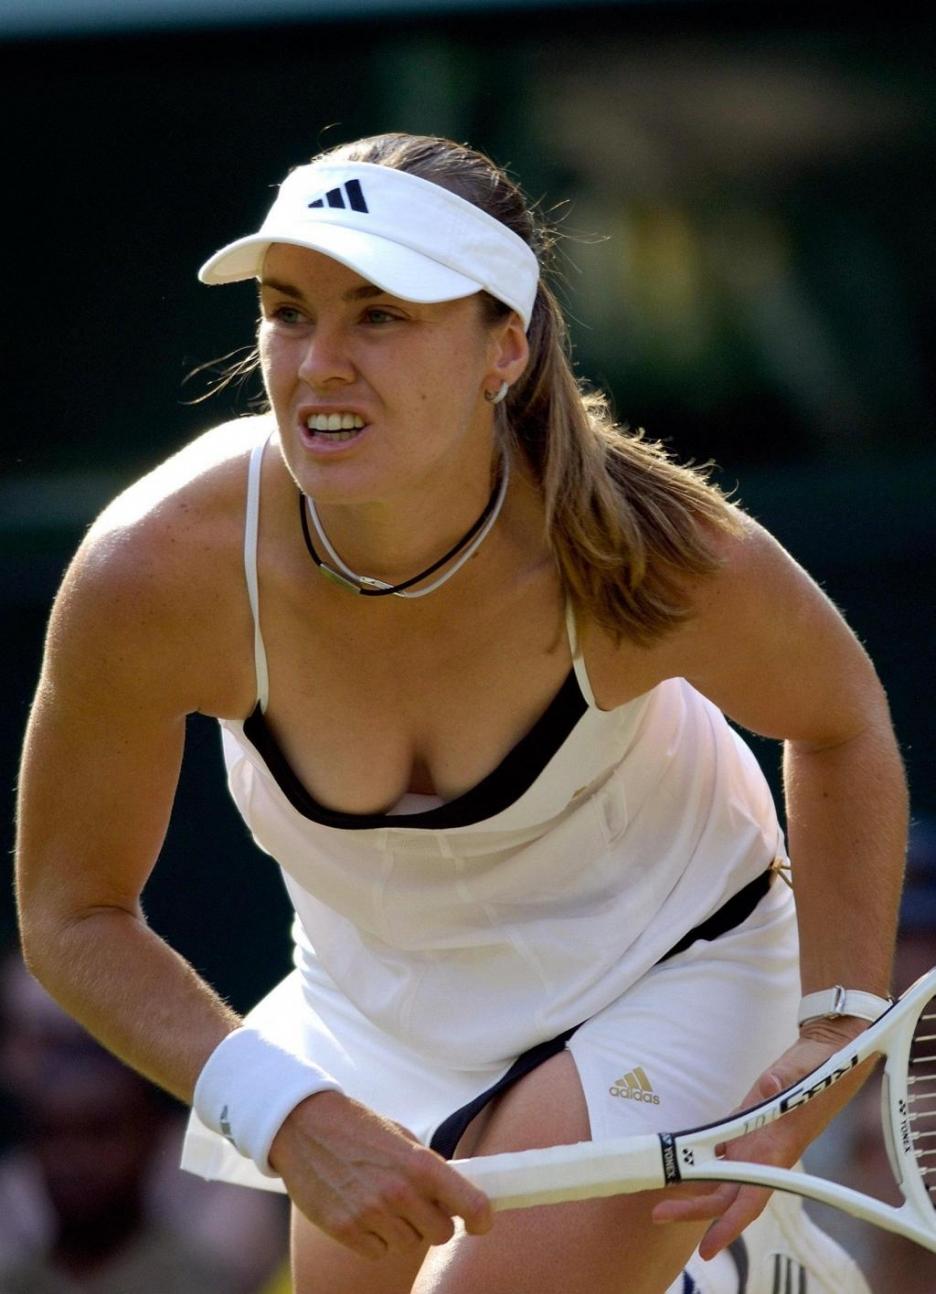 Martina Hingis, isviçreli tenis oyuncusu tarihte bugün